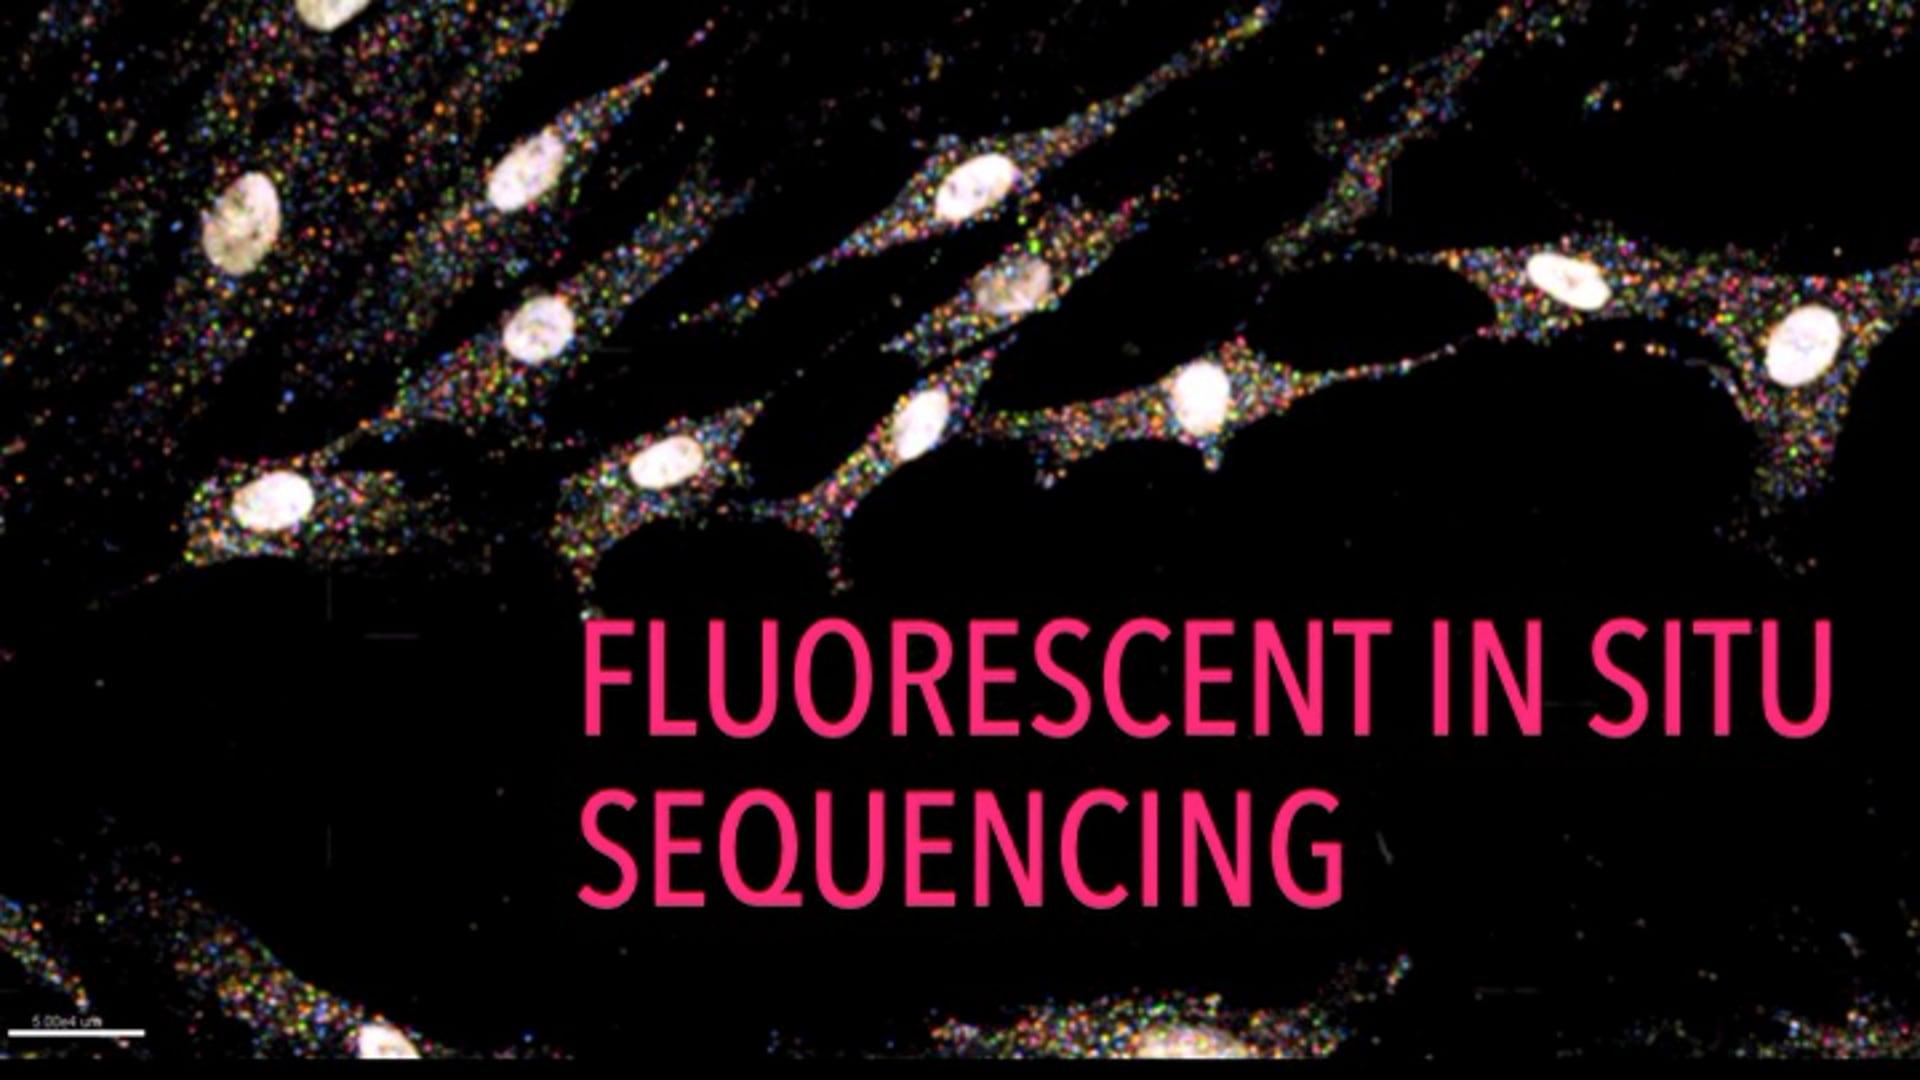 Fluorescent in situ Sequencing